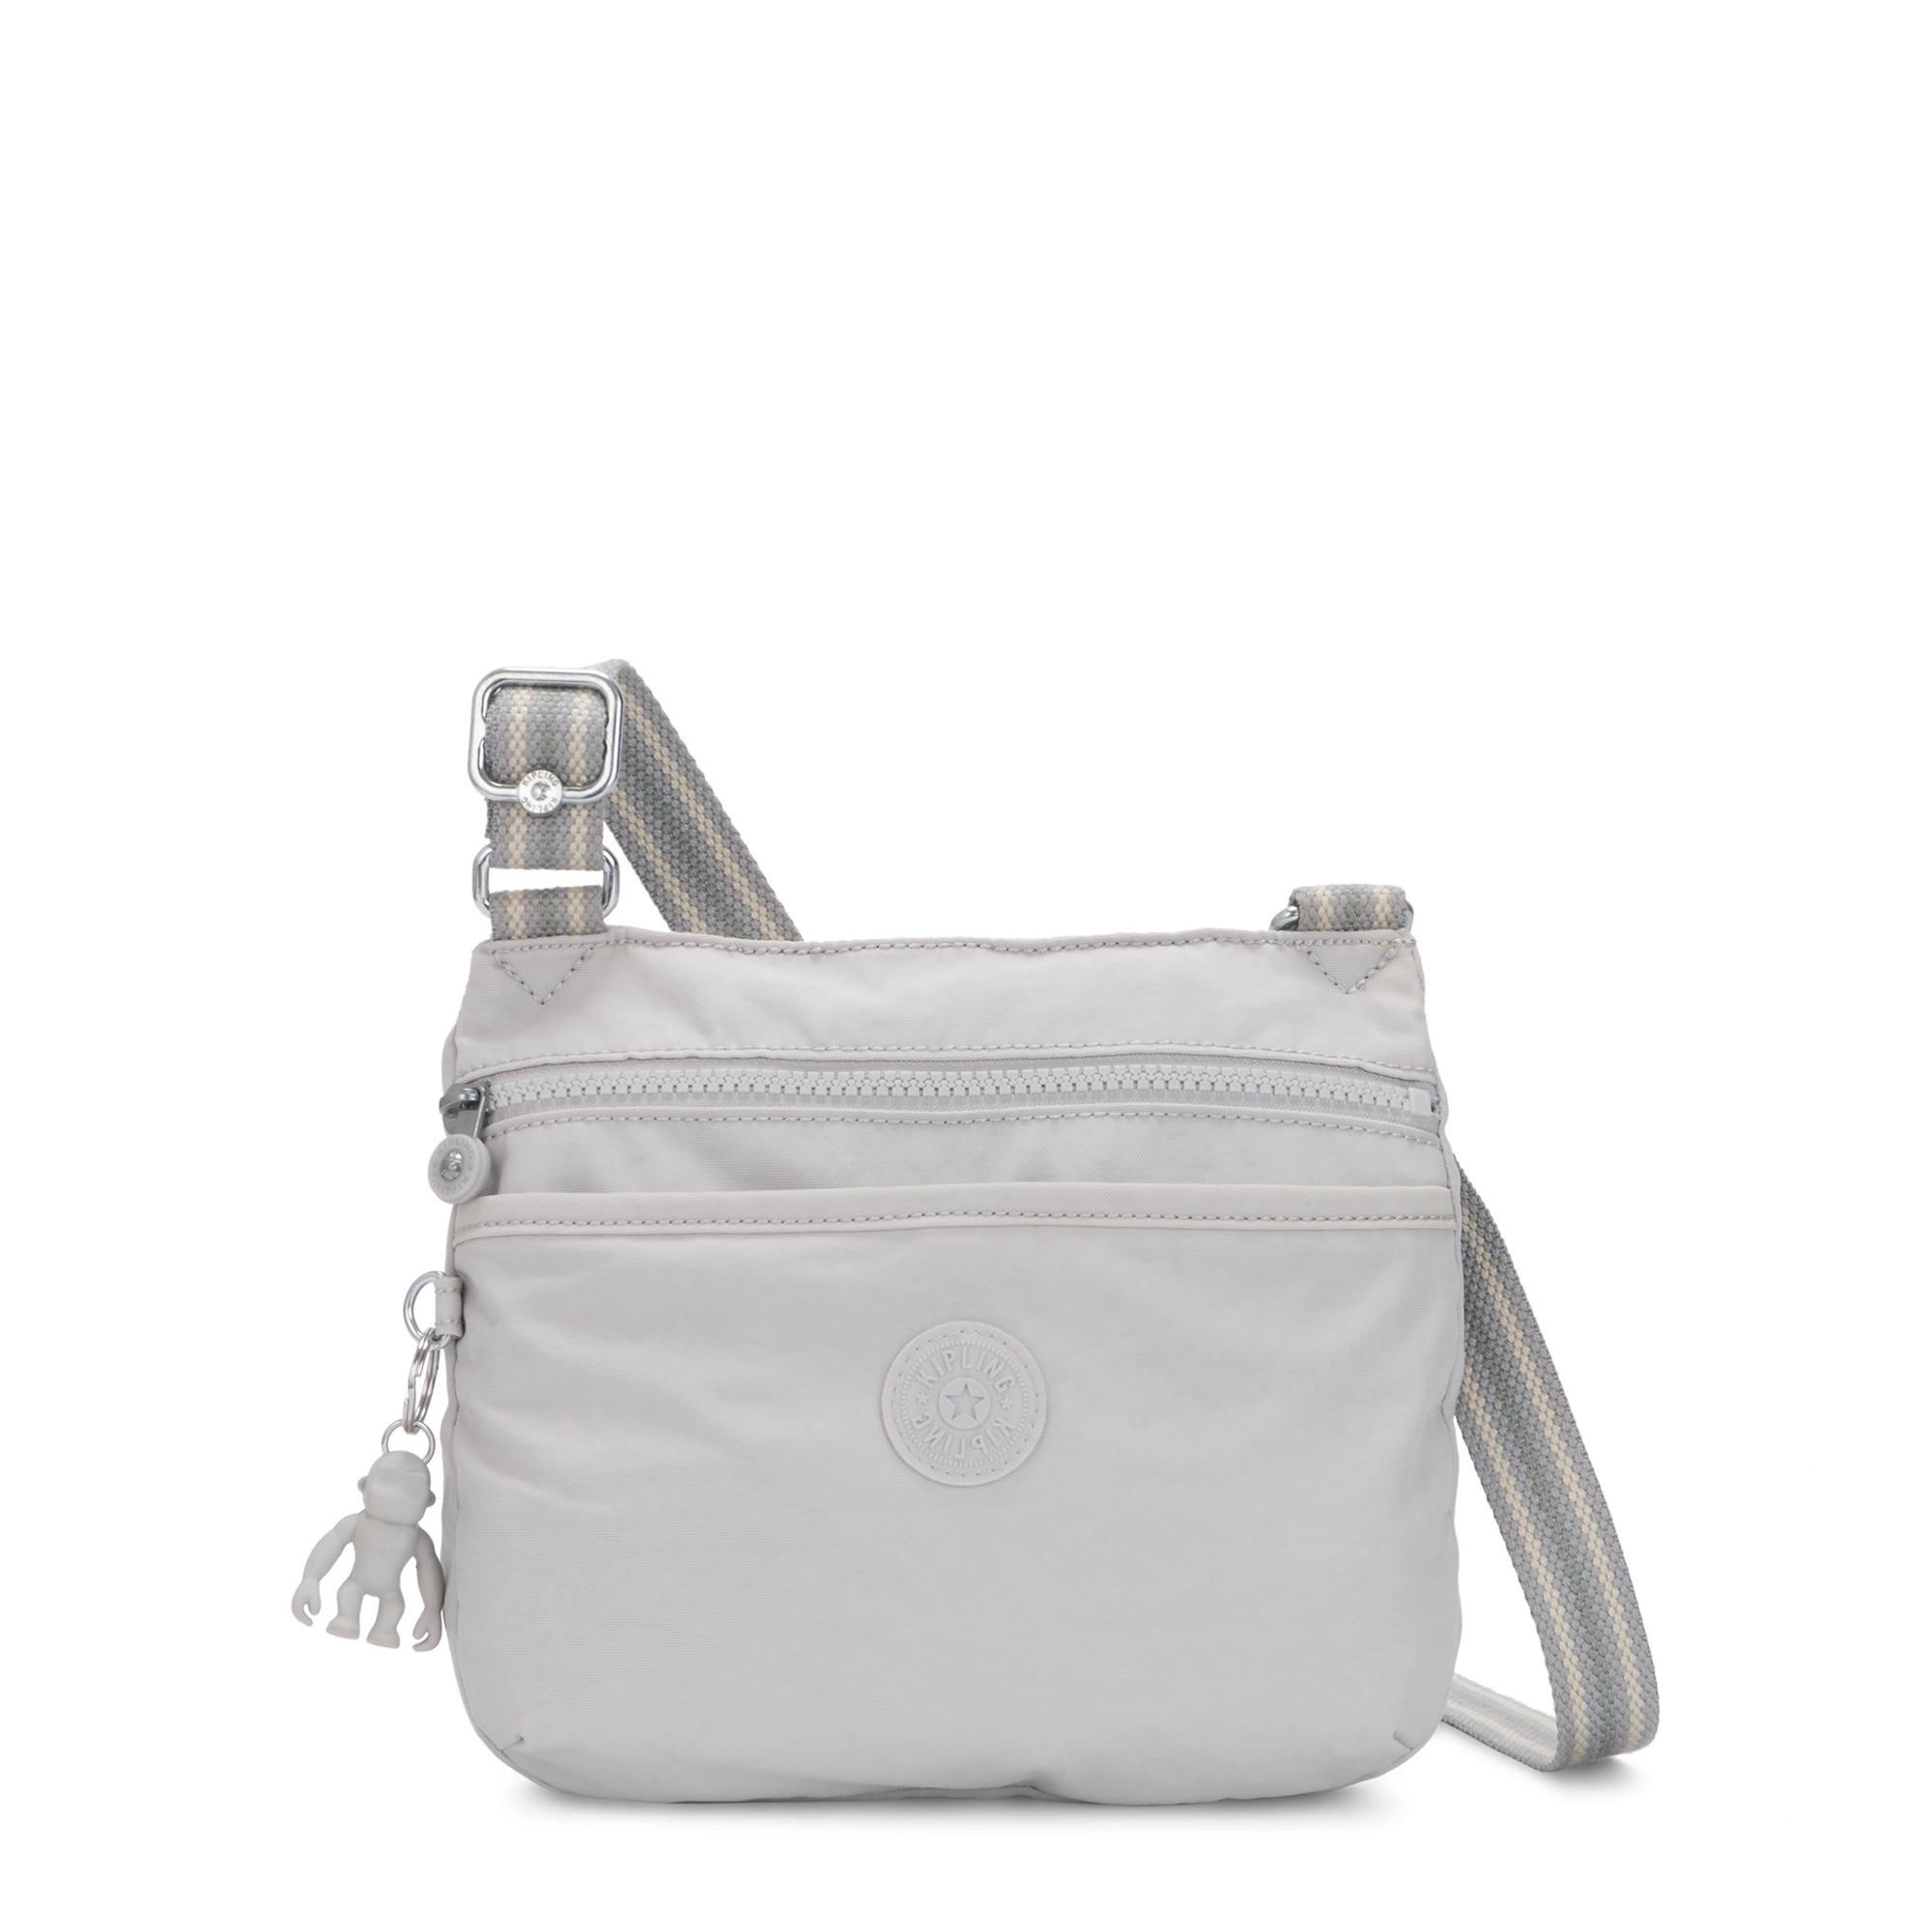 Kipling Emmylou Crossbody Bag